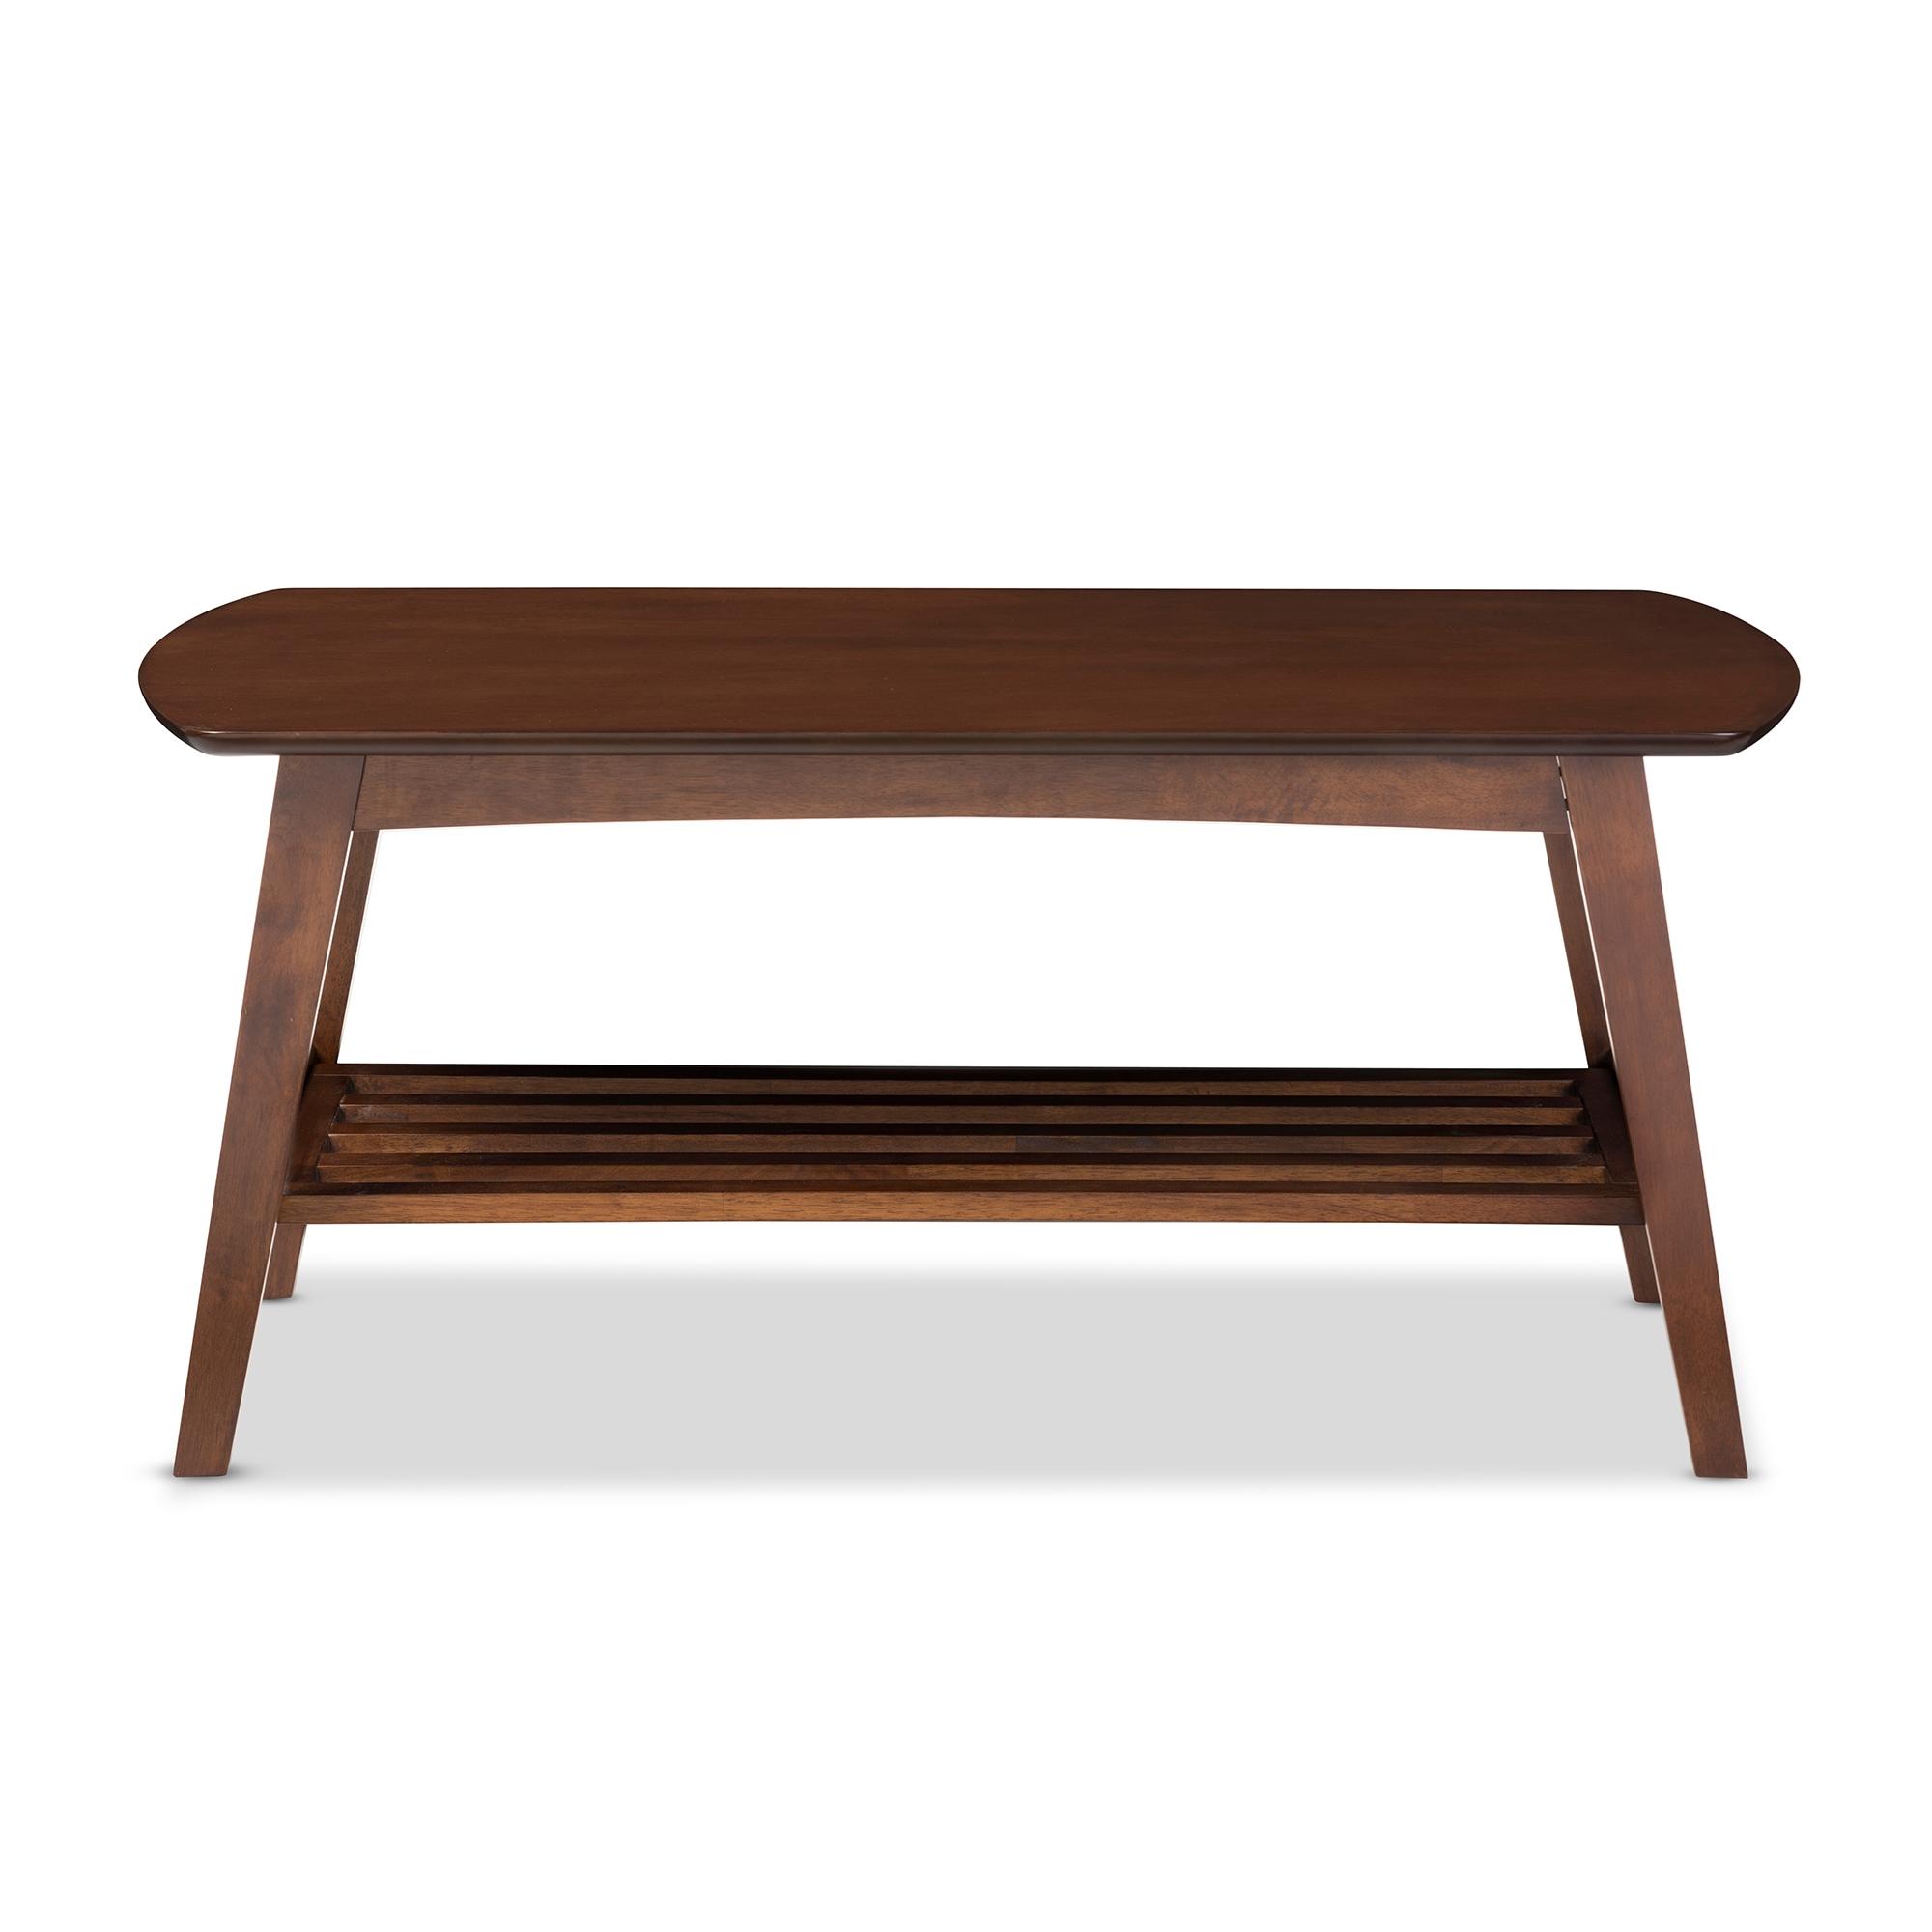 Baxton Studio   Wholesale Coffee Tables   Wholesale Living Room Furniture    Wholesale Furniture